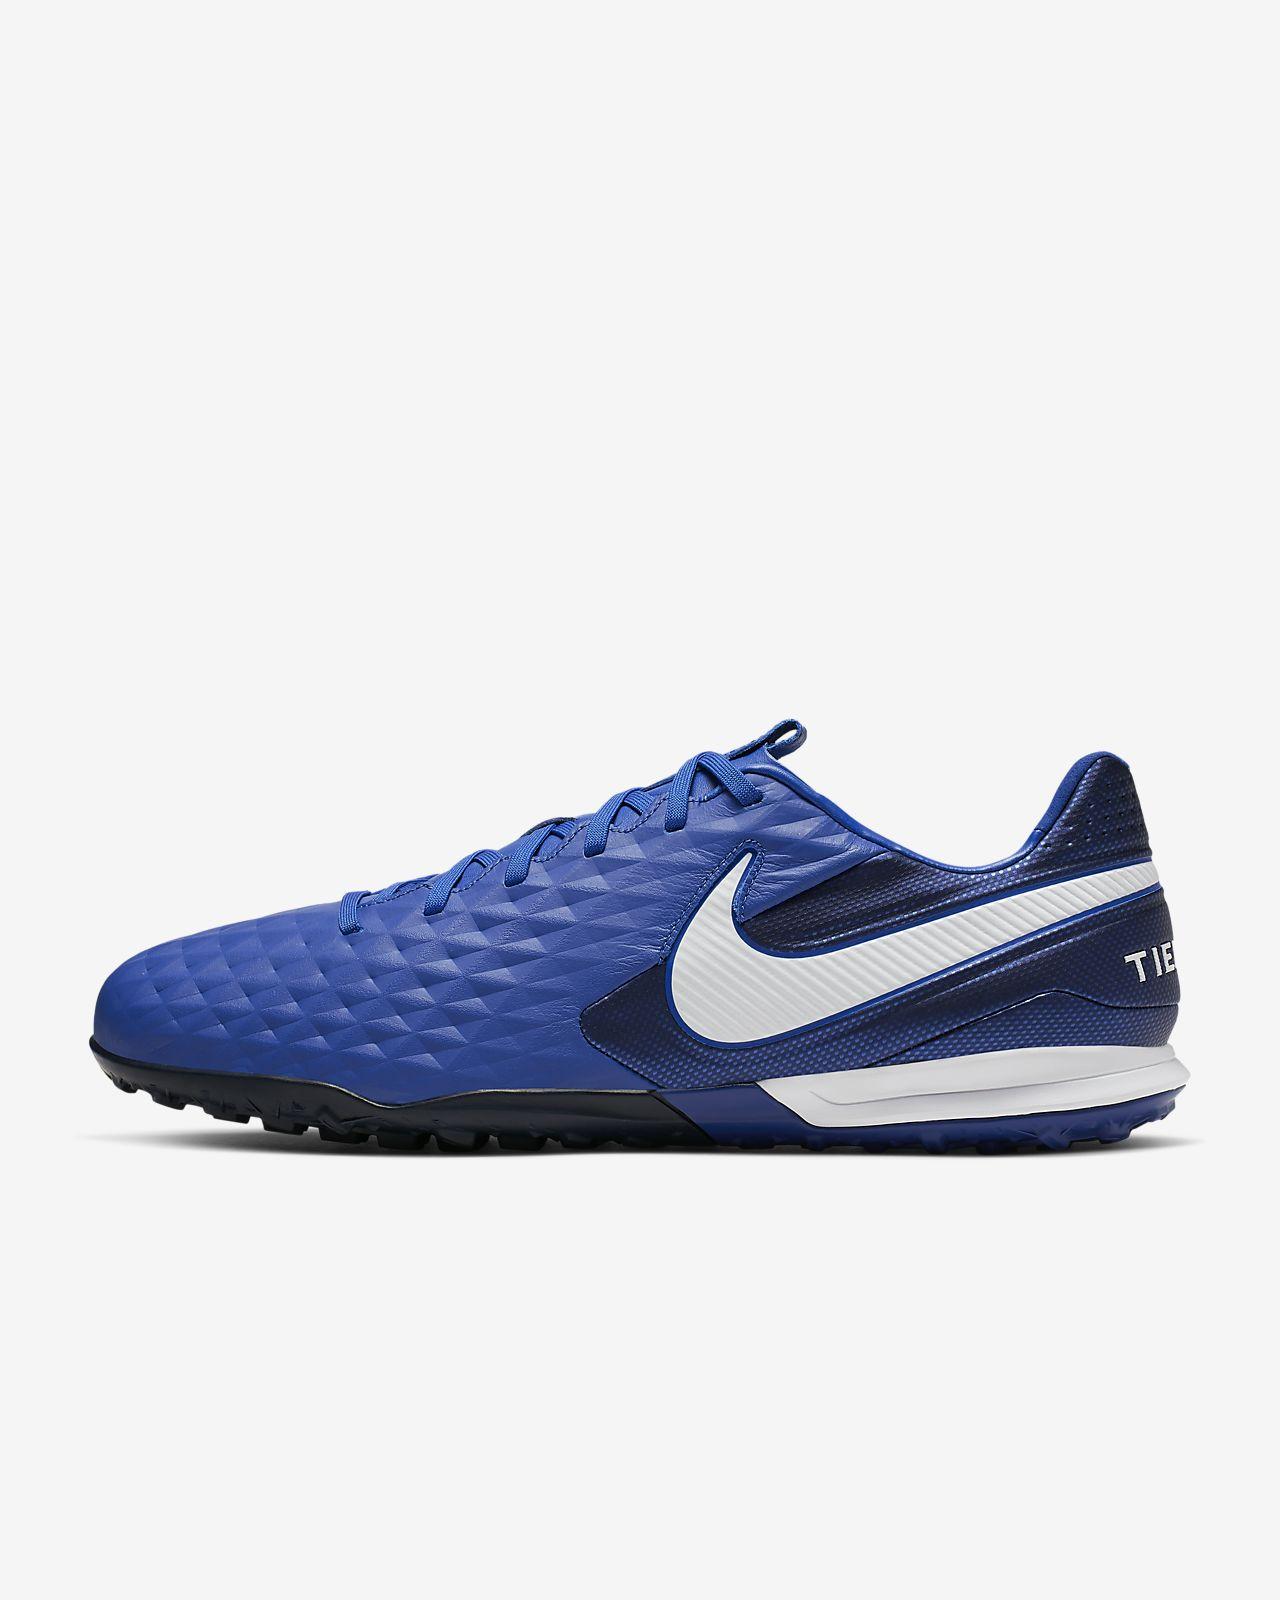 Para Césped Artificial Nike Legend De Deportivo Tiempo Calzado Tf 8 Pro Fútbol FlcK1J